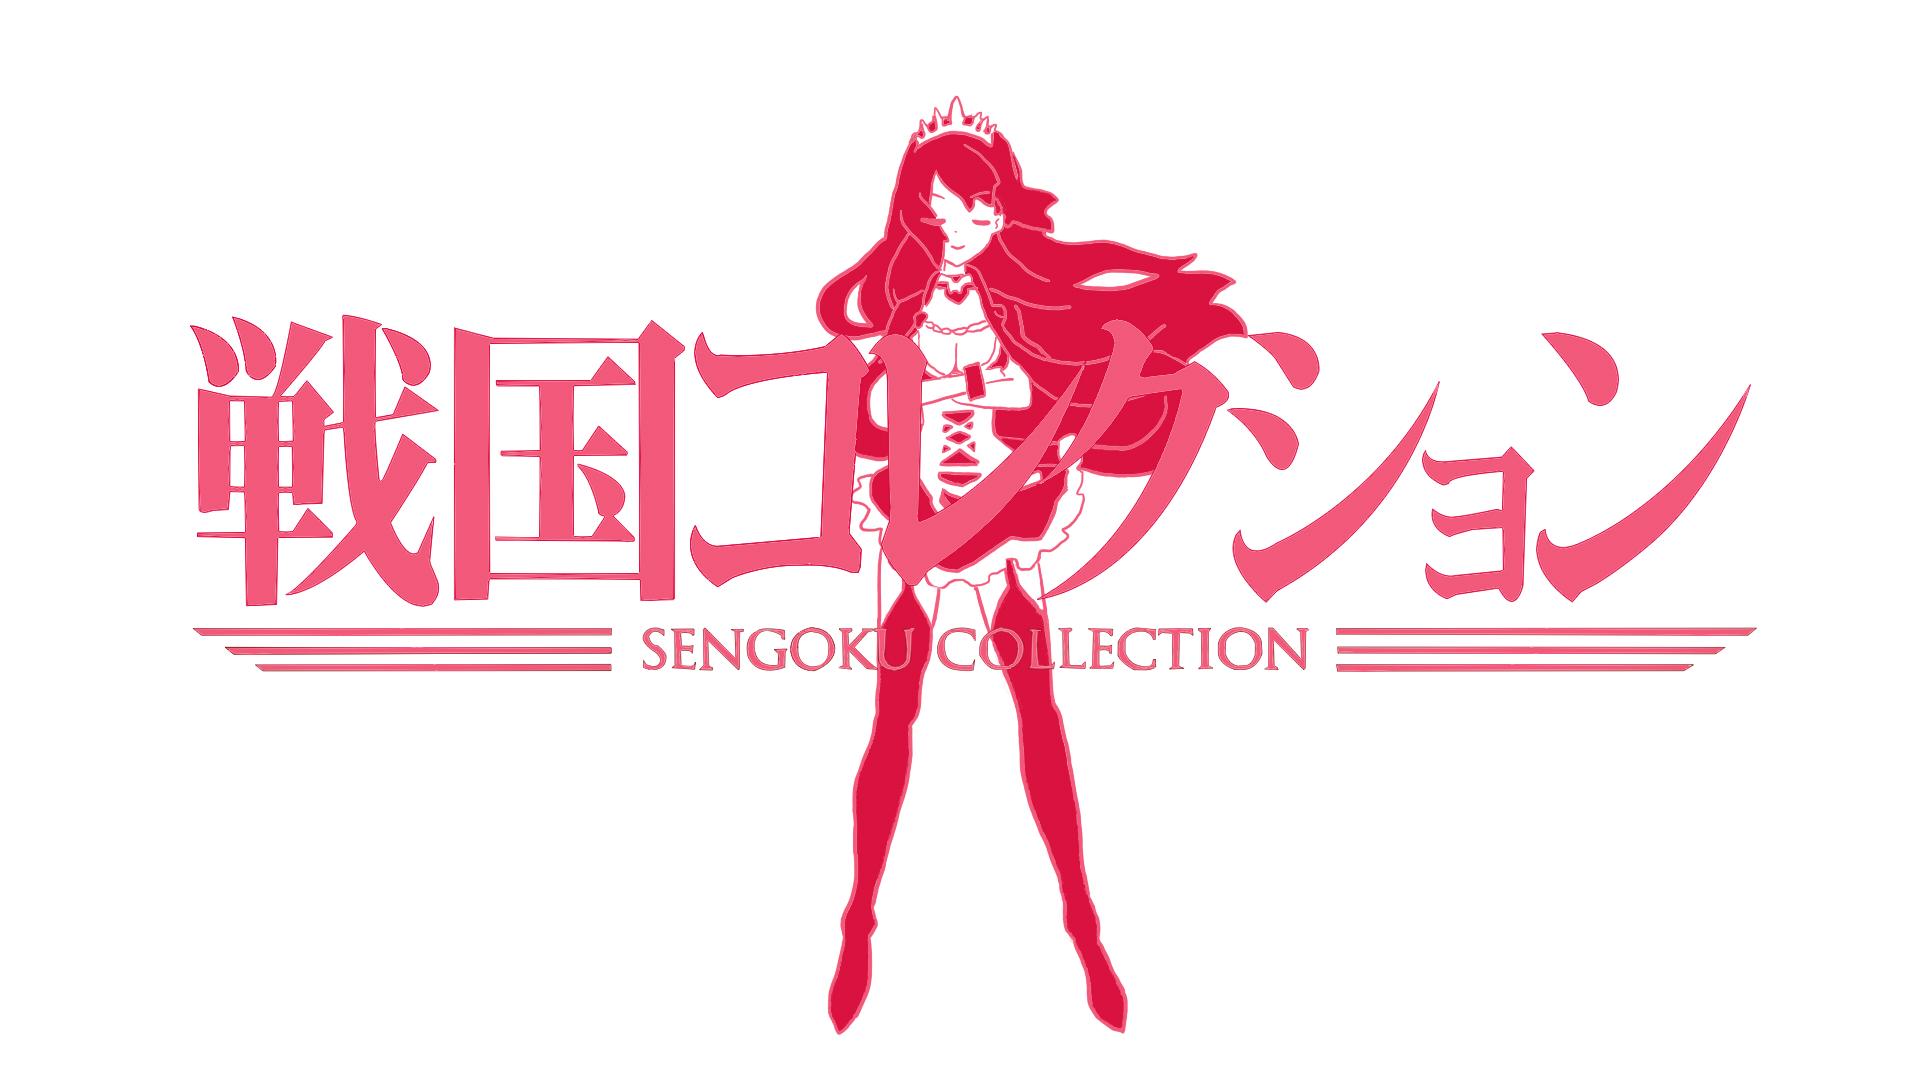 Sengoku Collection Wallpaper by otakuyaro on DeviantArt